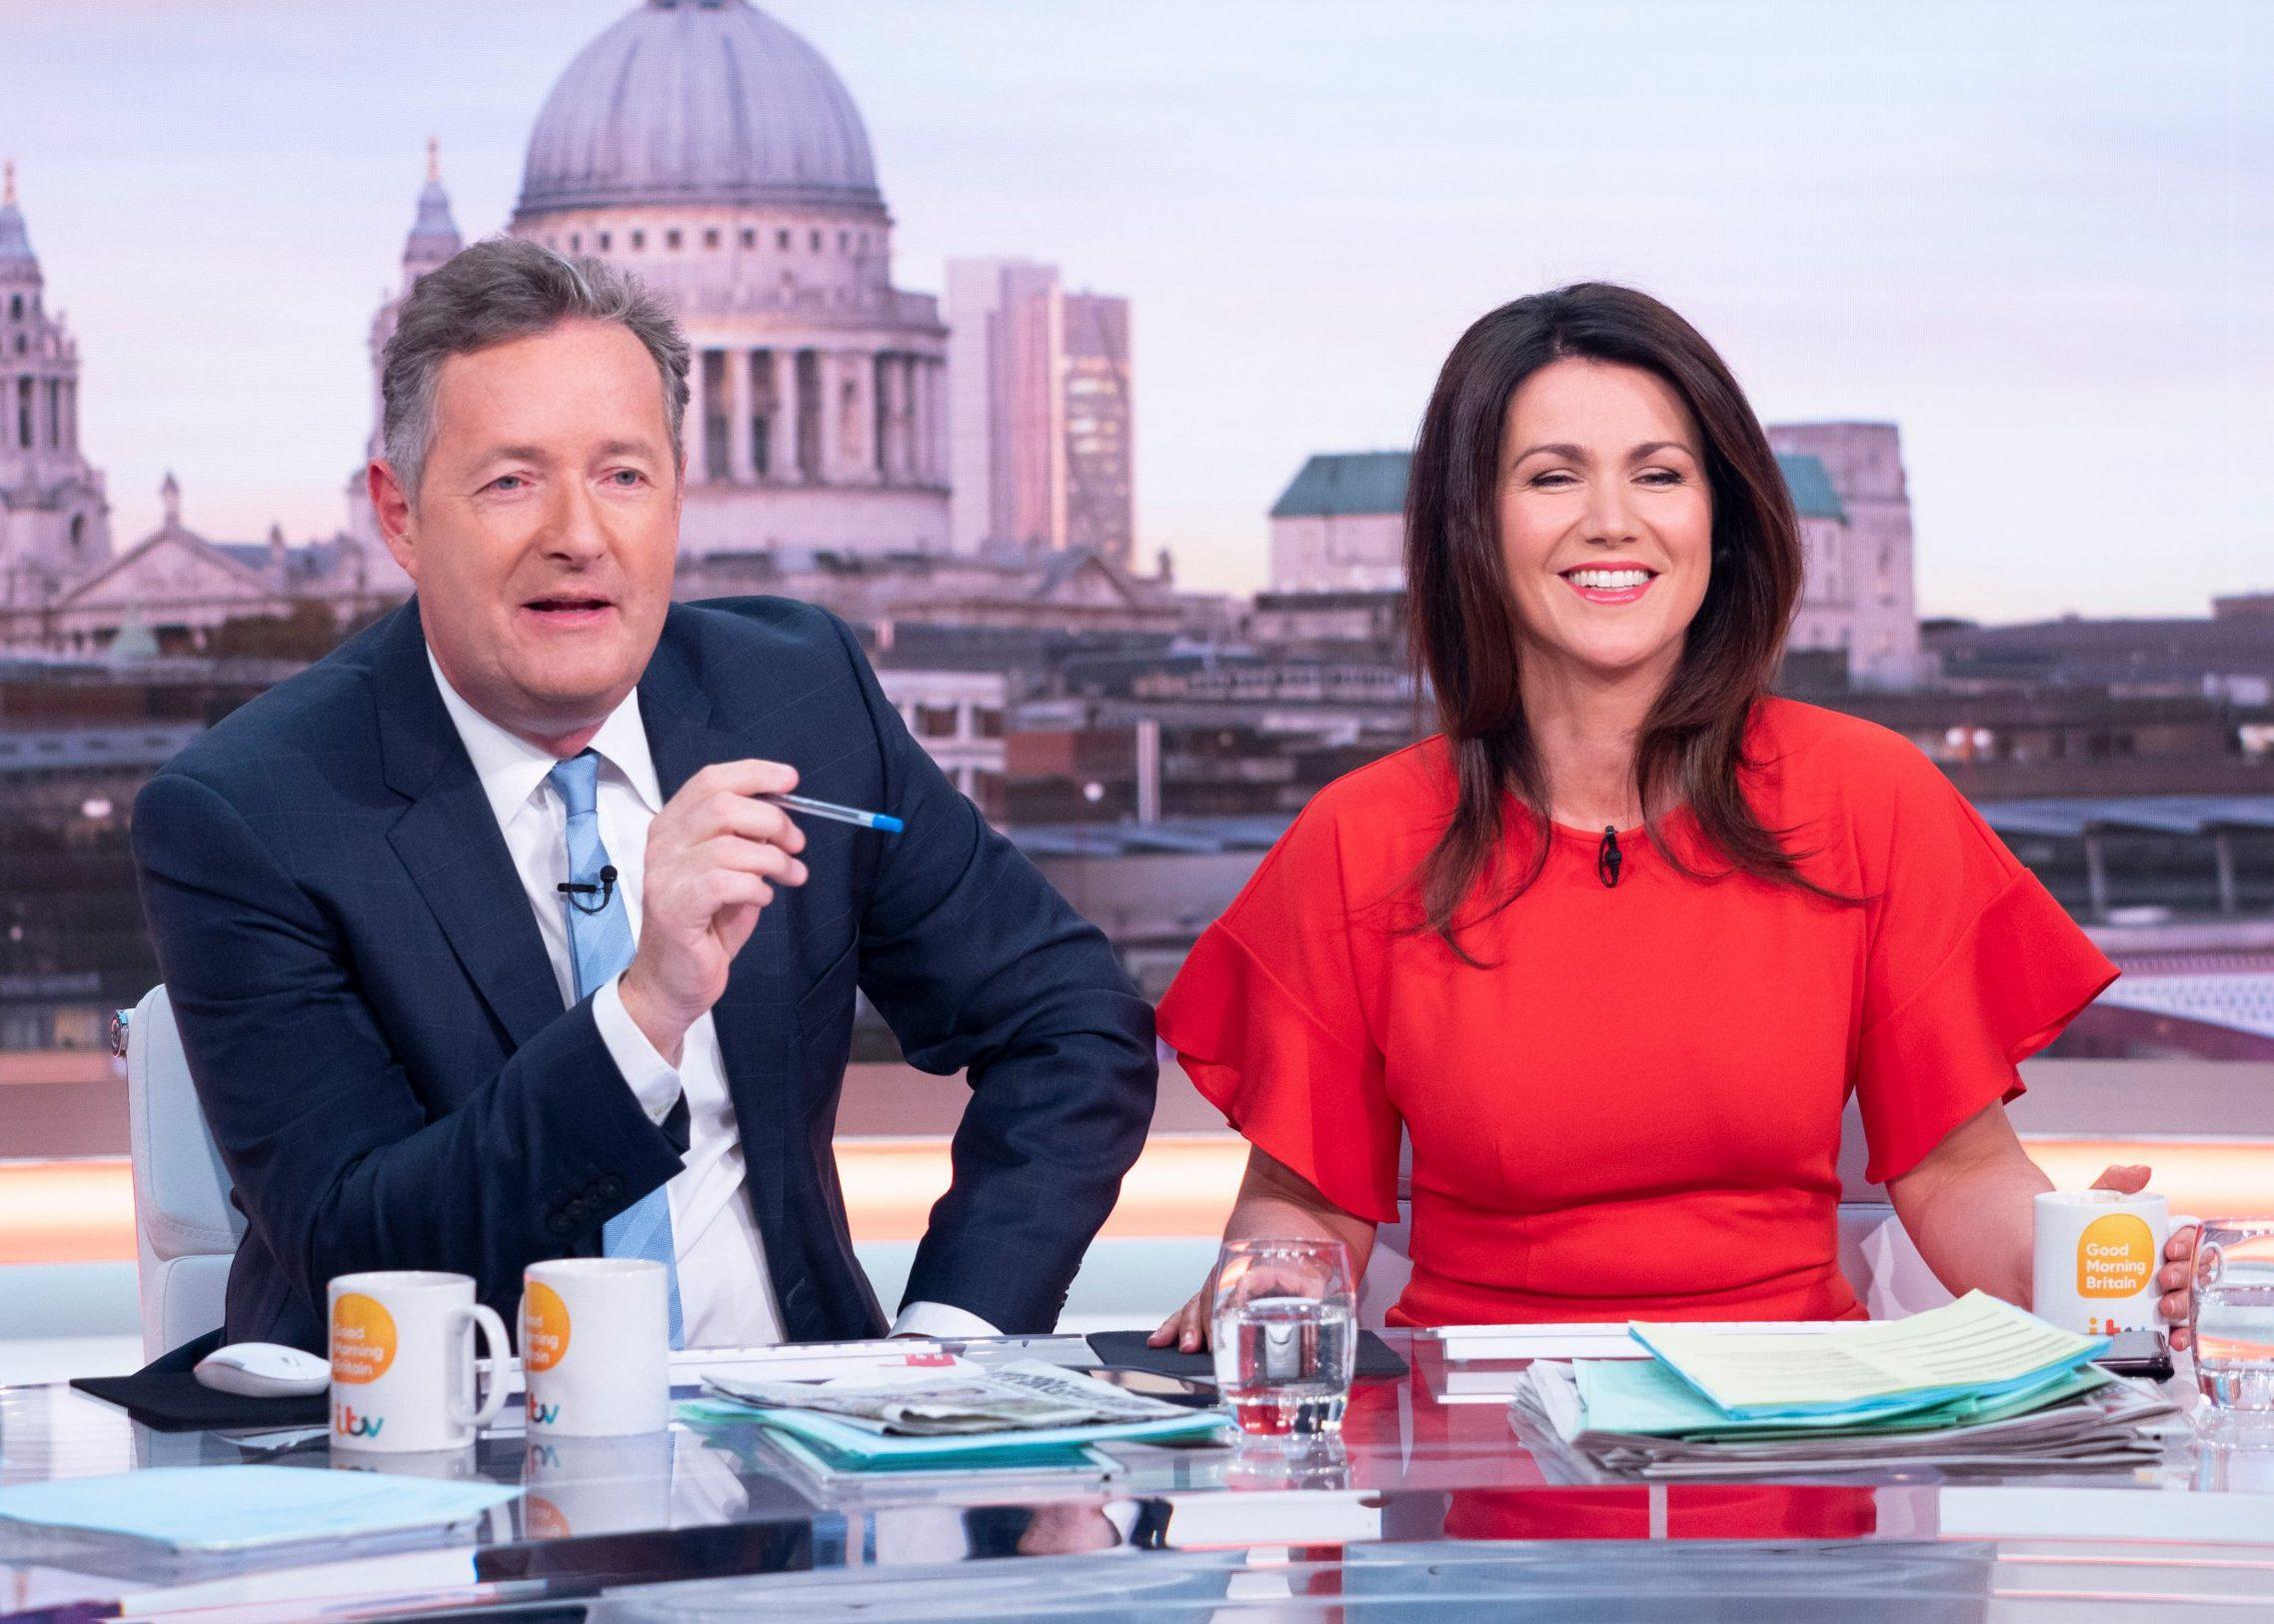 EDITORIAL USE ONLY. NO MERCHANDISING Mandatory Credit: Photo by Ken McKay/ITV/REX/Shutterstock (9632677f) Piers Morgan and Susanna Reid 'Good Morning Britain' TV show, London, UK - 16 Apr 2018